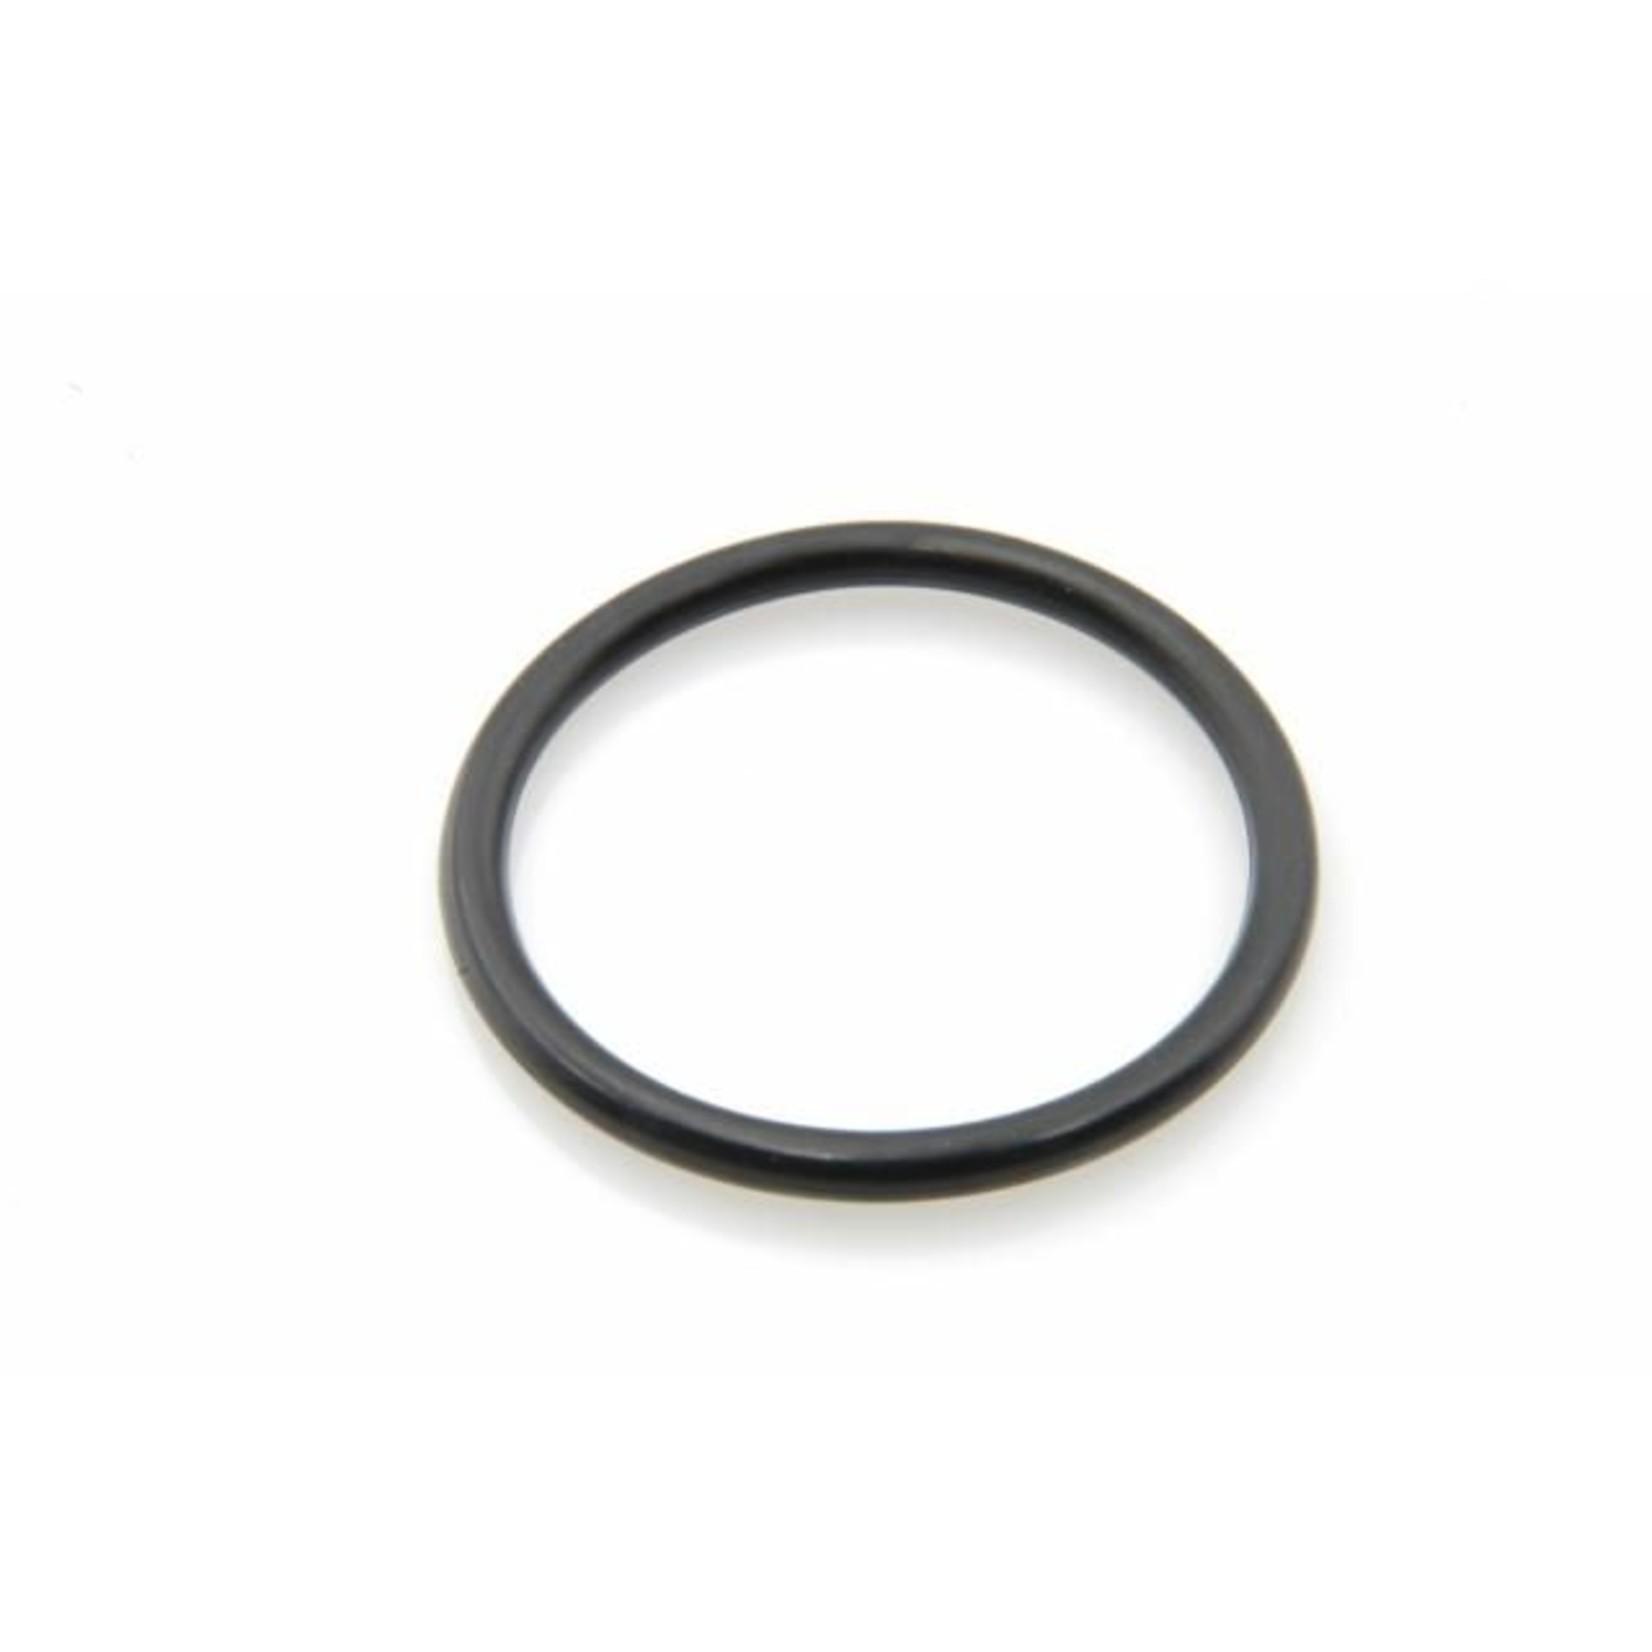 Sealing ring plunging tube hydraulic tank Nr Org: 24827009